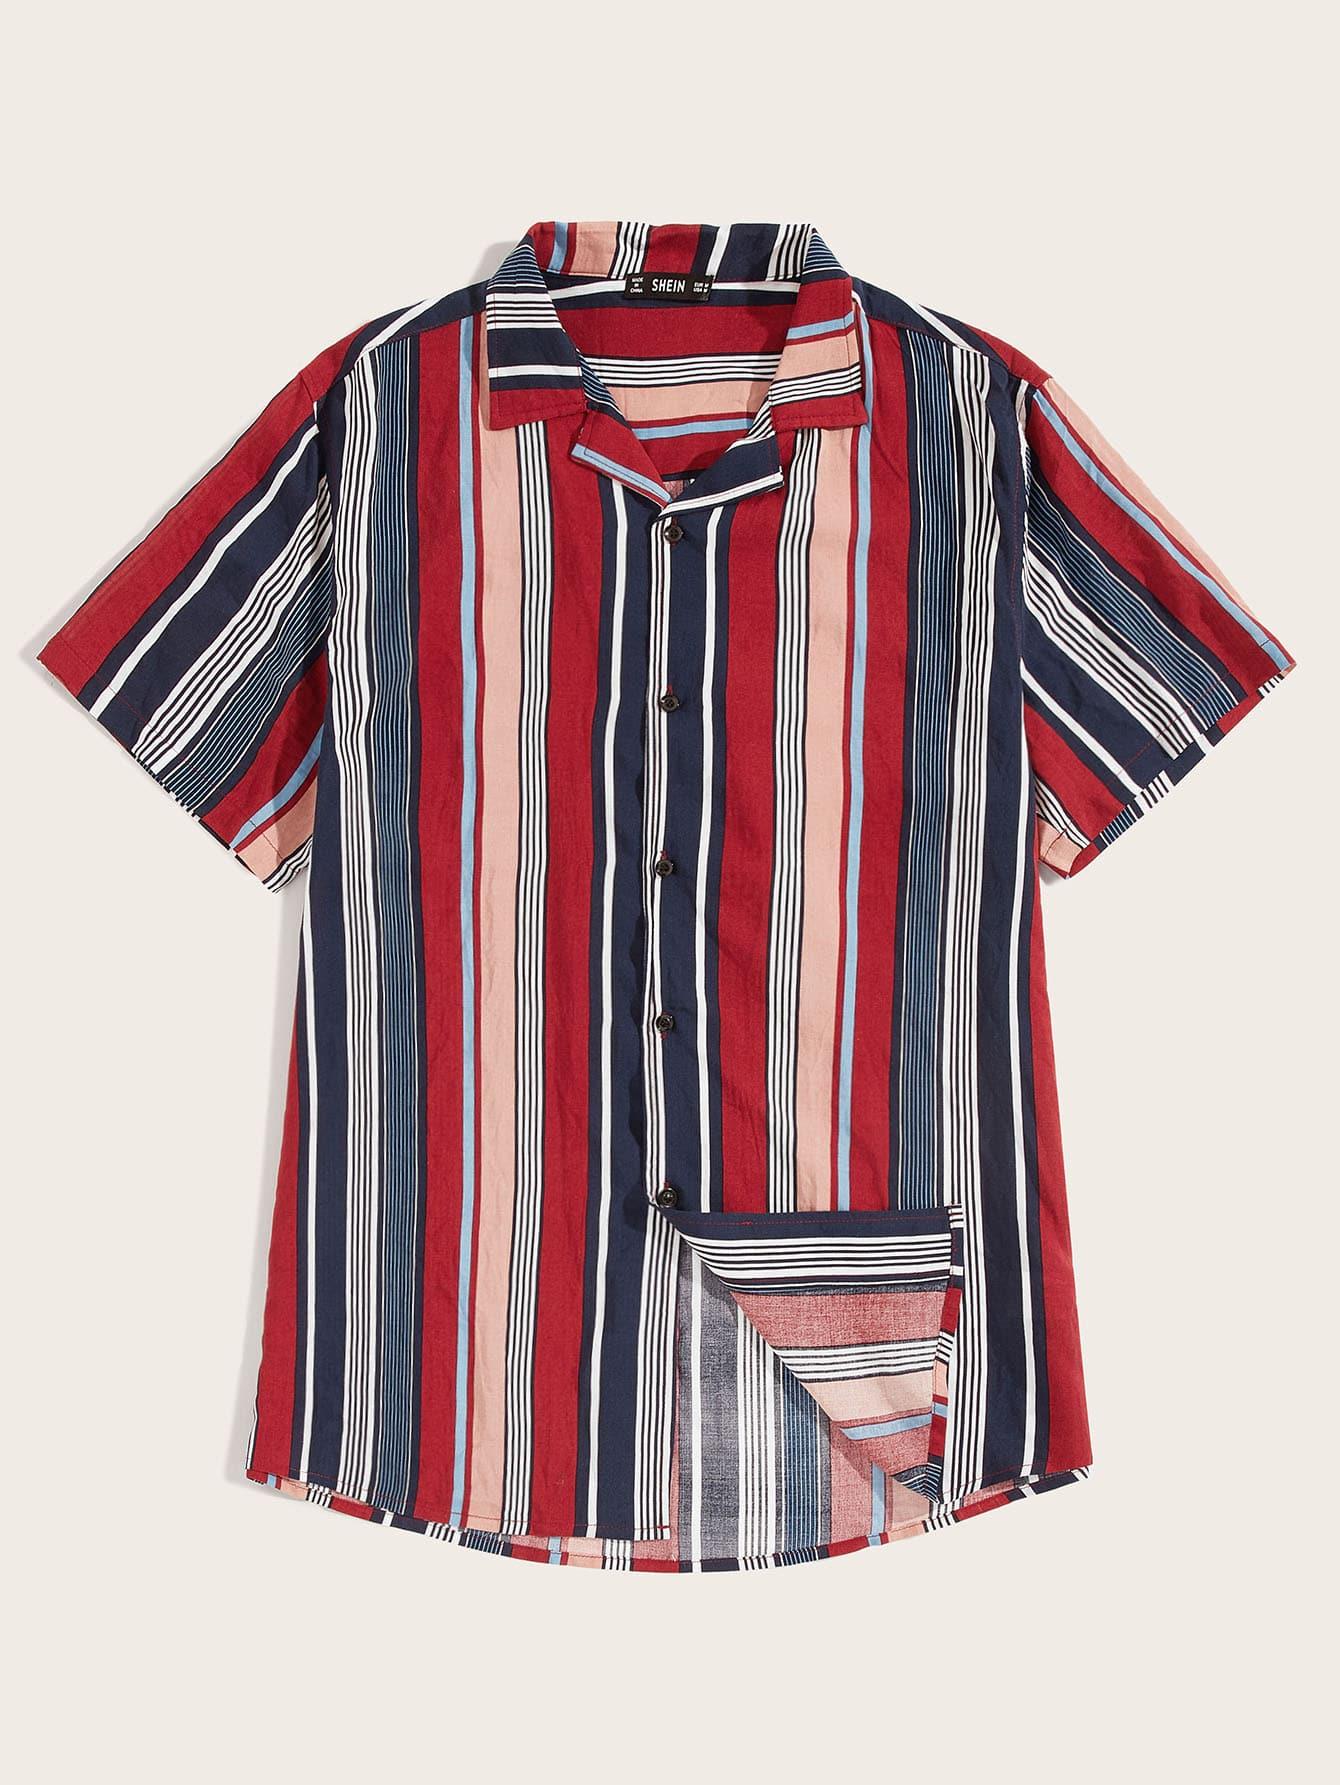 e2f9721c51 Men Notched Colorblock Striped Shirt | SHEIN